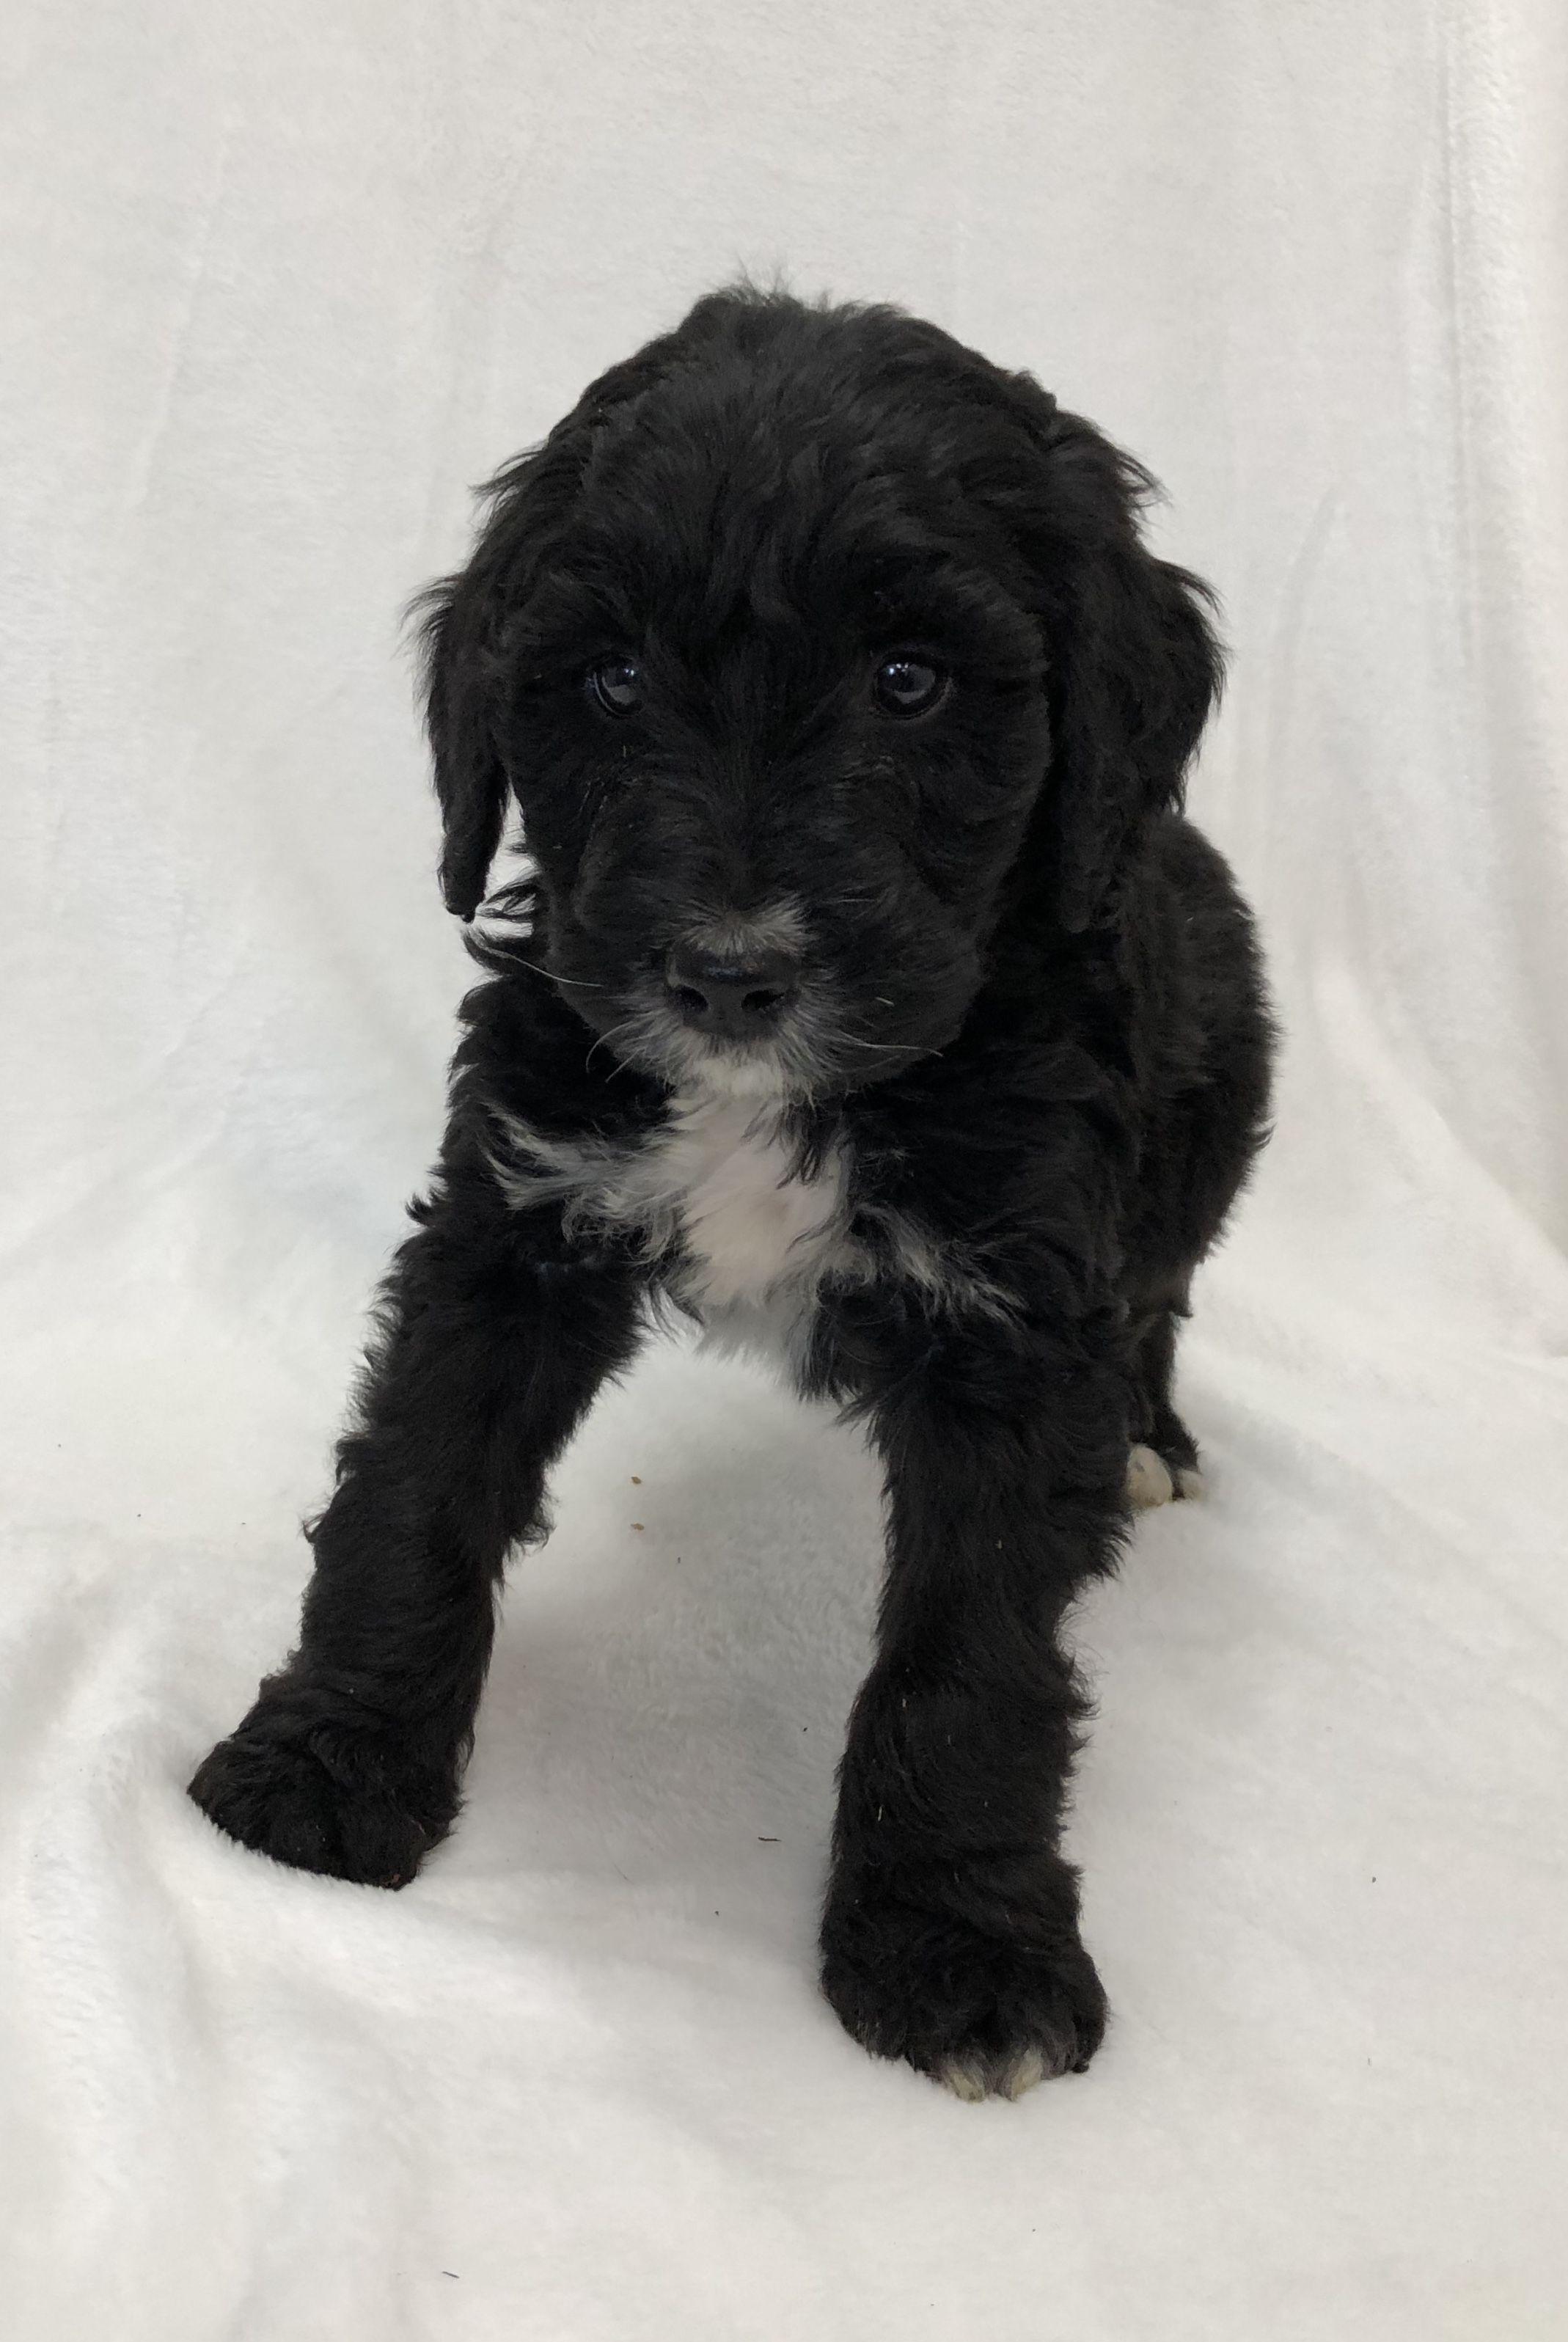 Max French Bulldog pups for sale near Brooklyn, New York